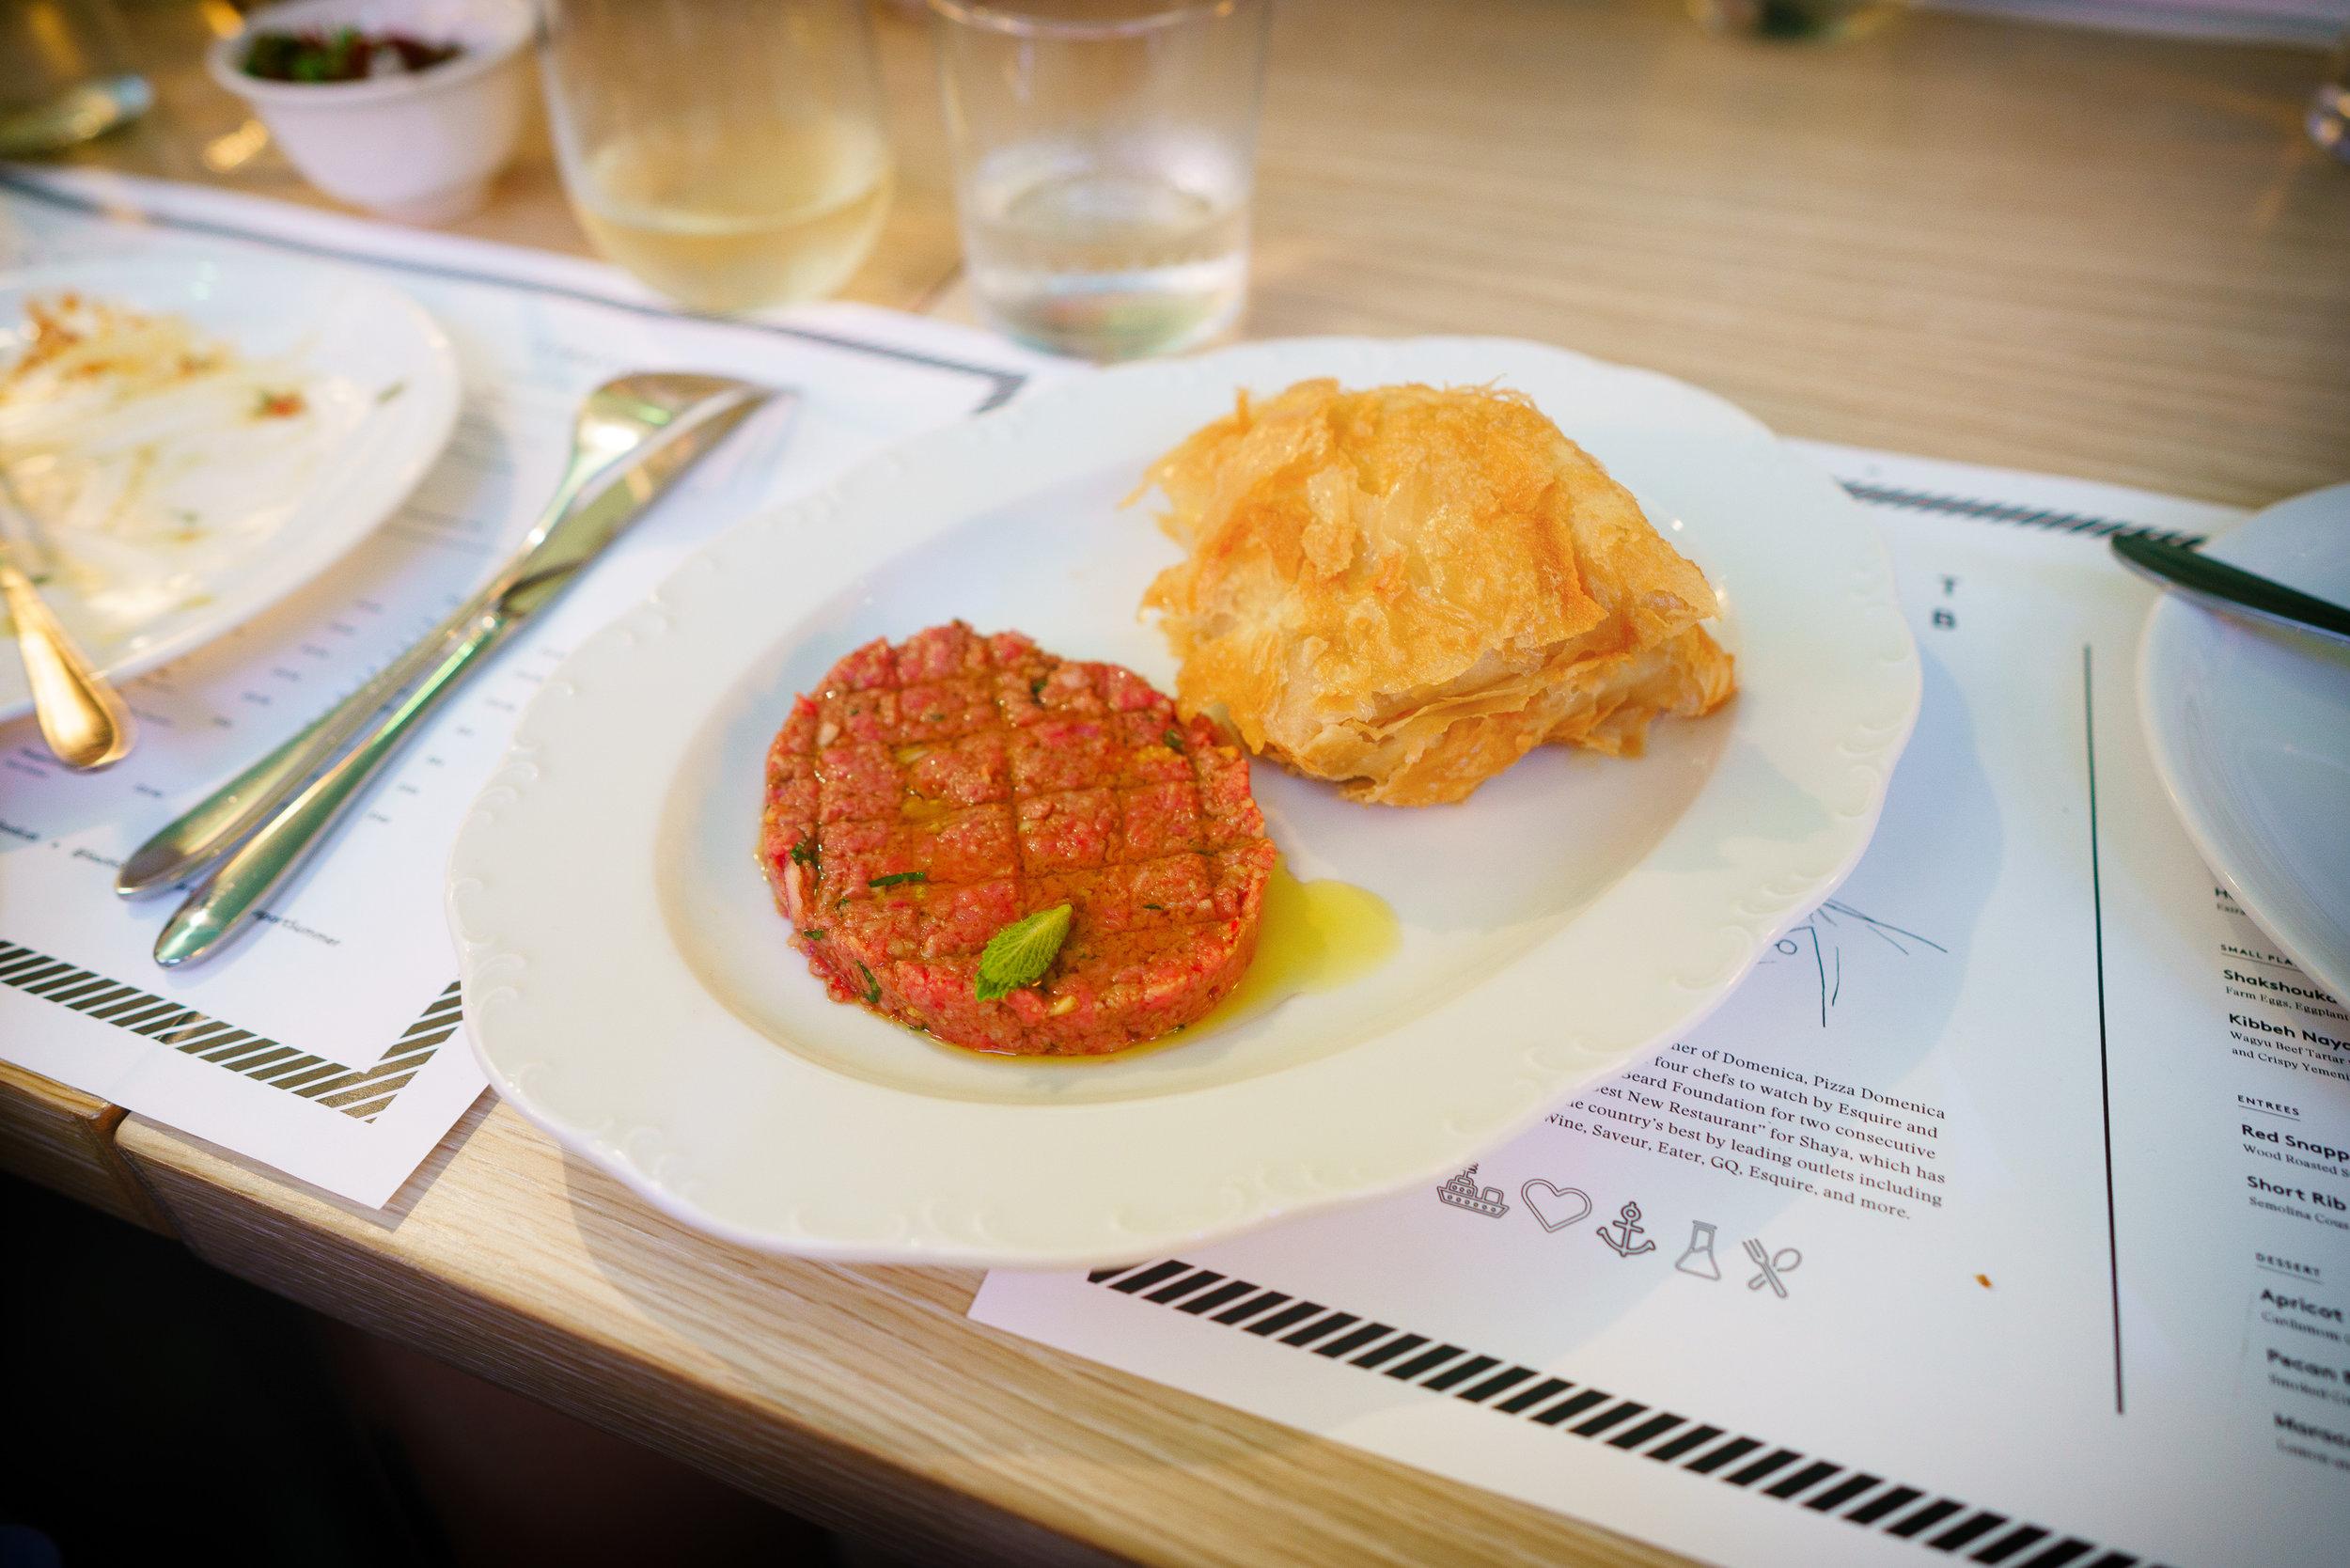 Kibbeh Nayah: Wagyu beef tartar w/ pomegranate molasses, Yemenite flatbread